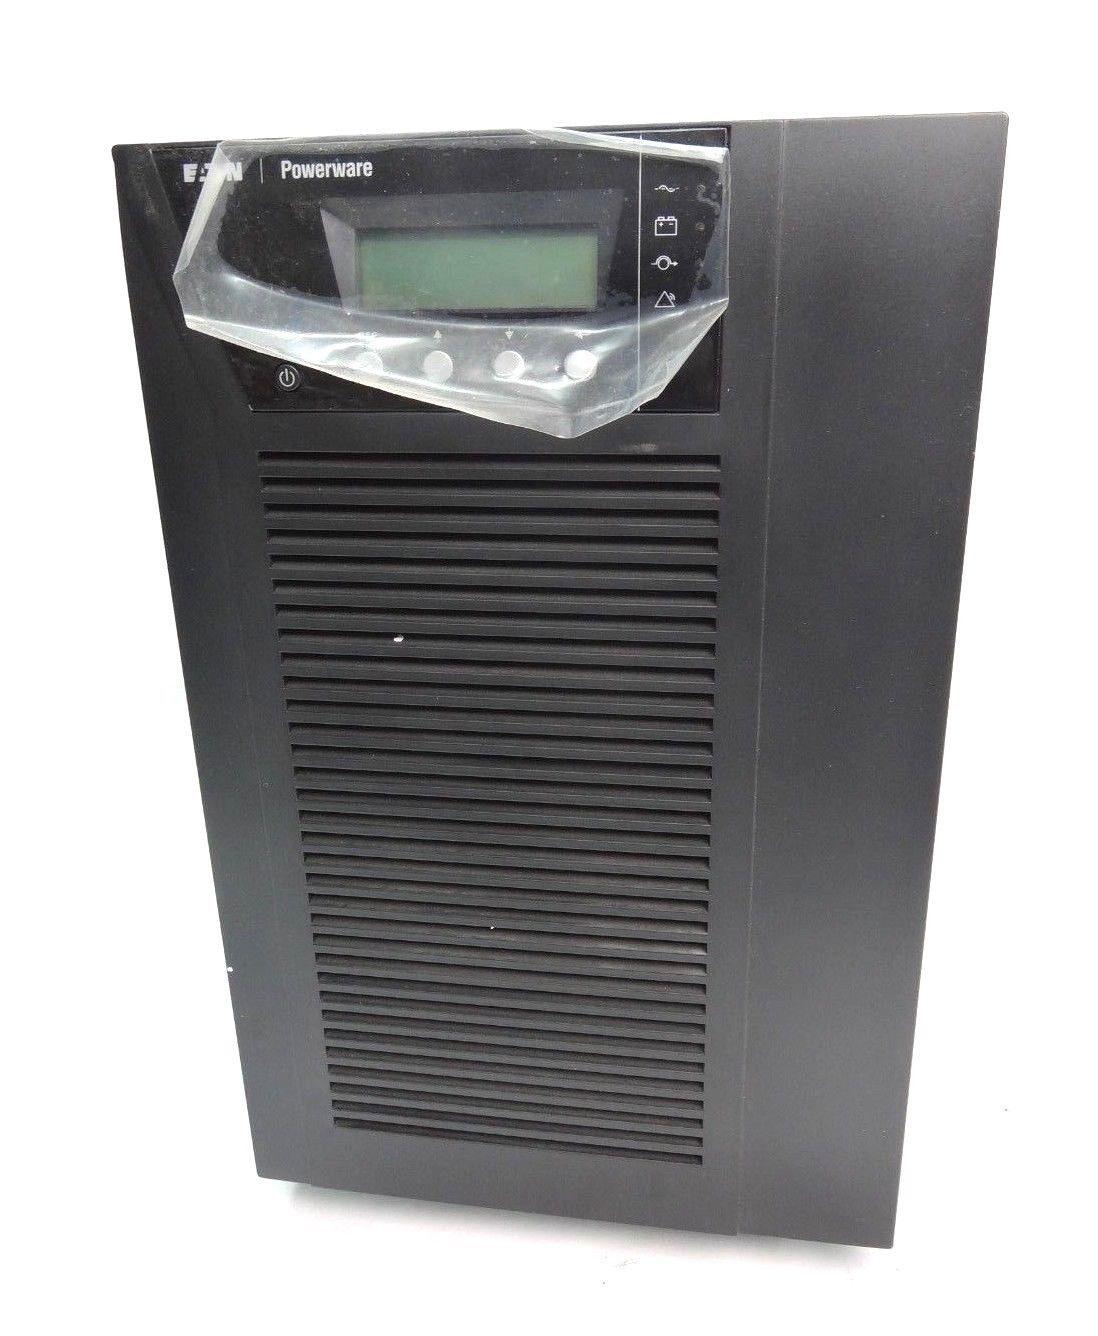 Eaton Powerware 9130 PW9130G3000T-XLEU and 50 similar items